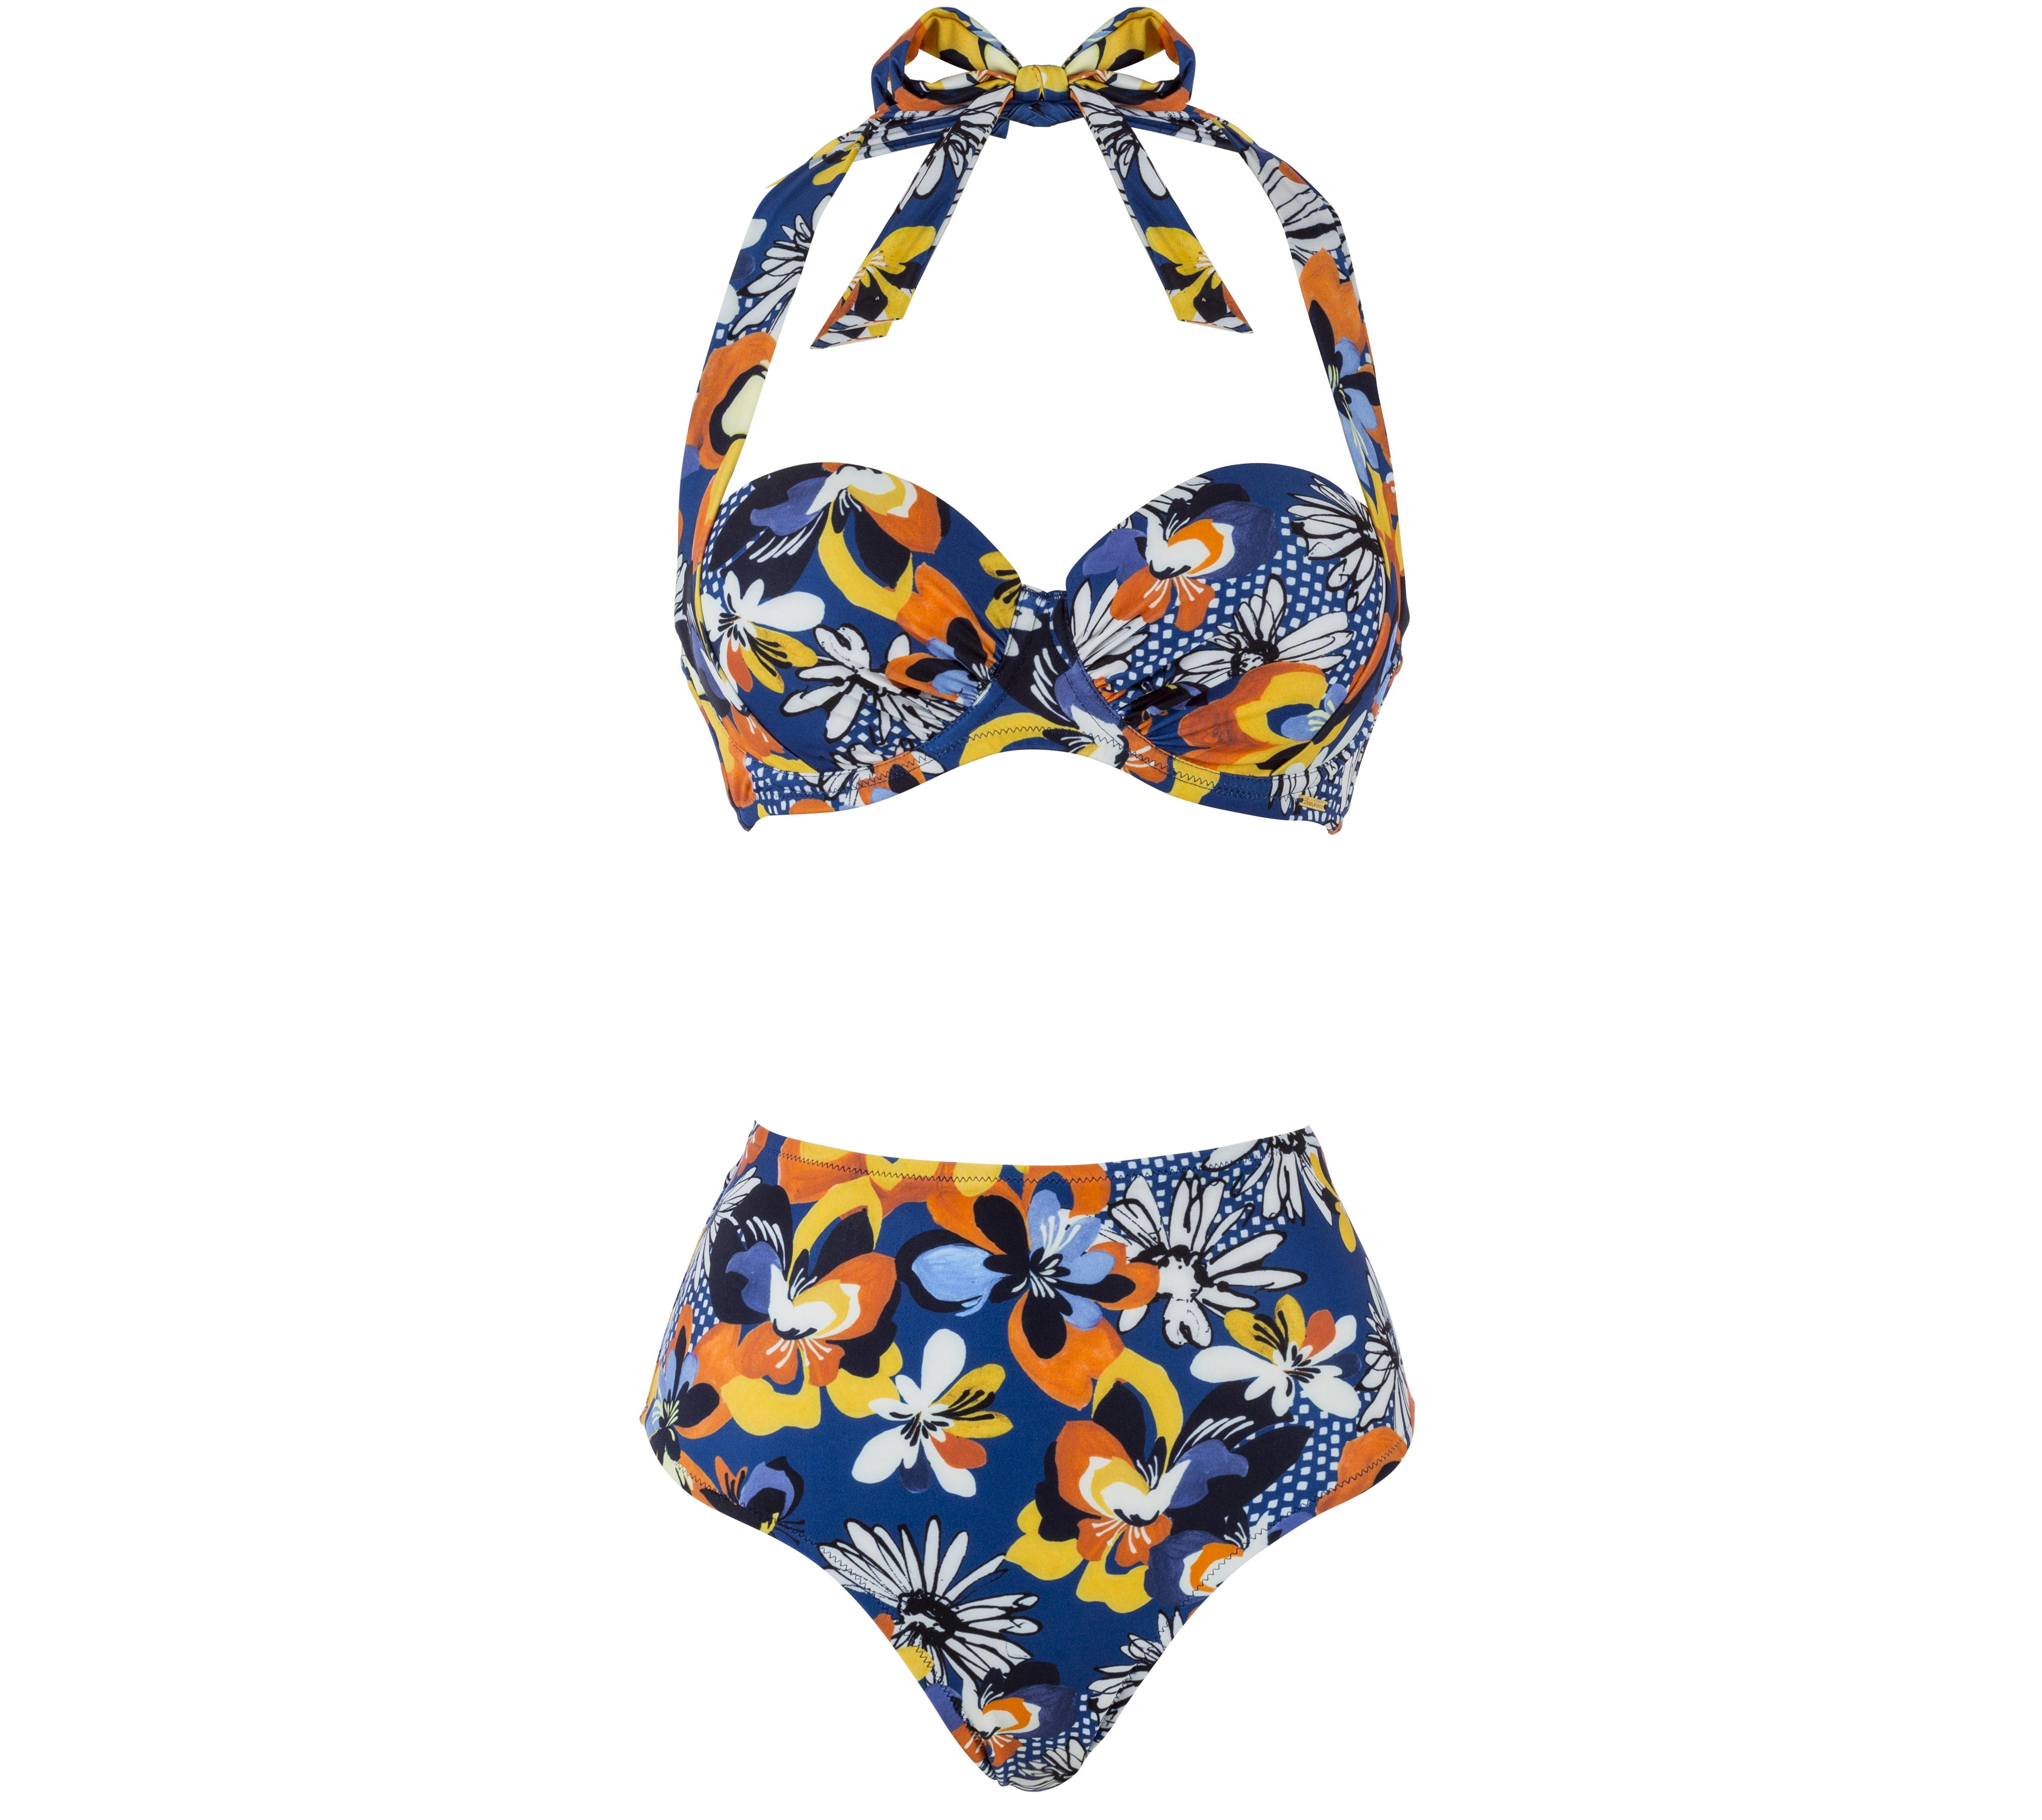 b36c0012b1 Boux Avenue Adelaide Sling Bikini Top and High-waisted Bikini Briefs